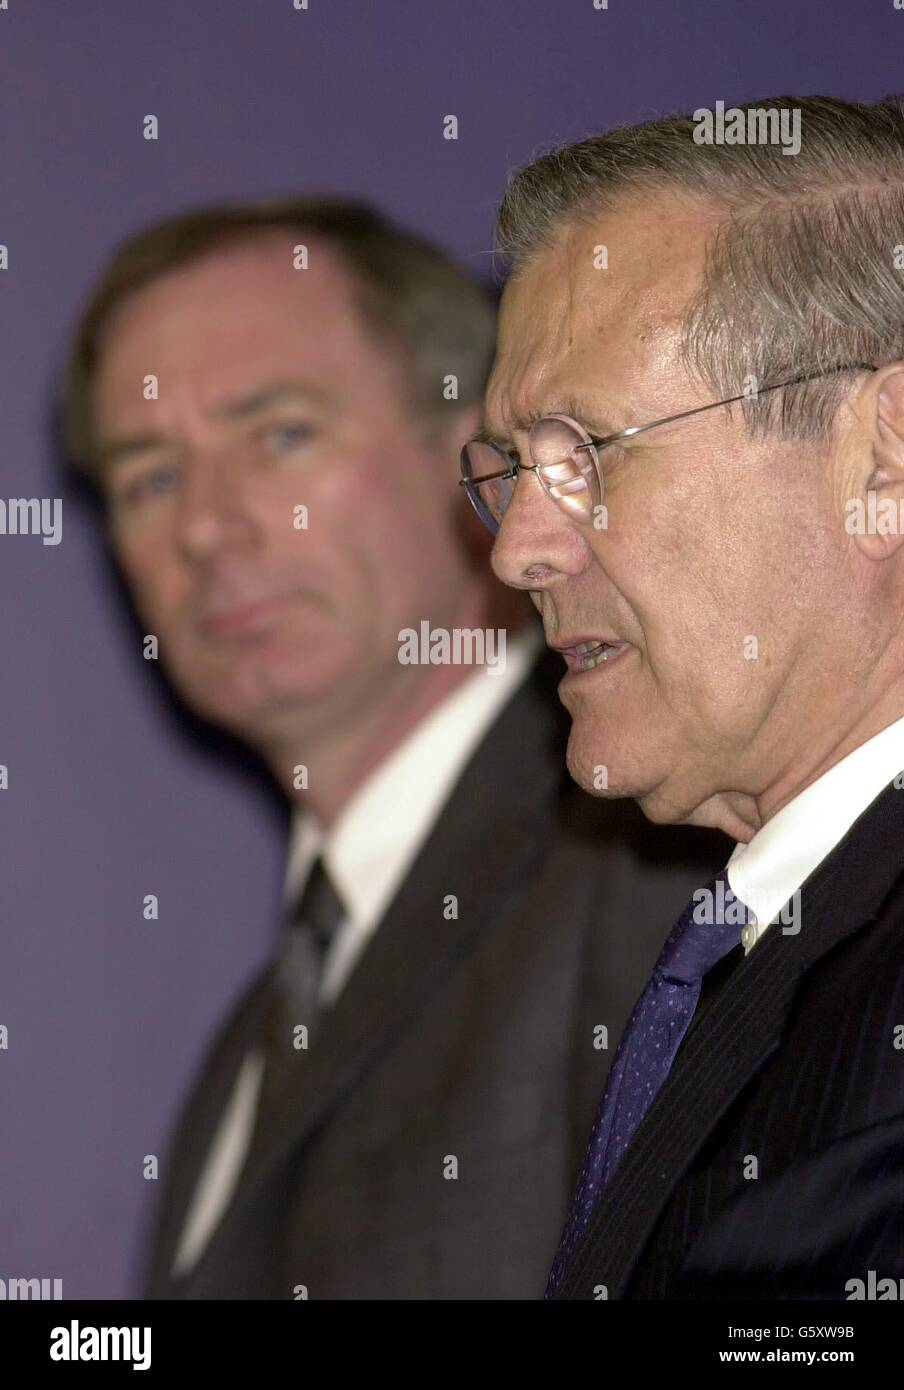 Donald Rumsfeld press conference - Stock Image